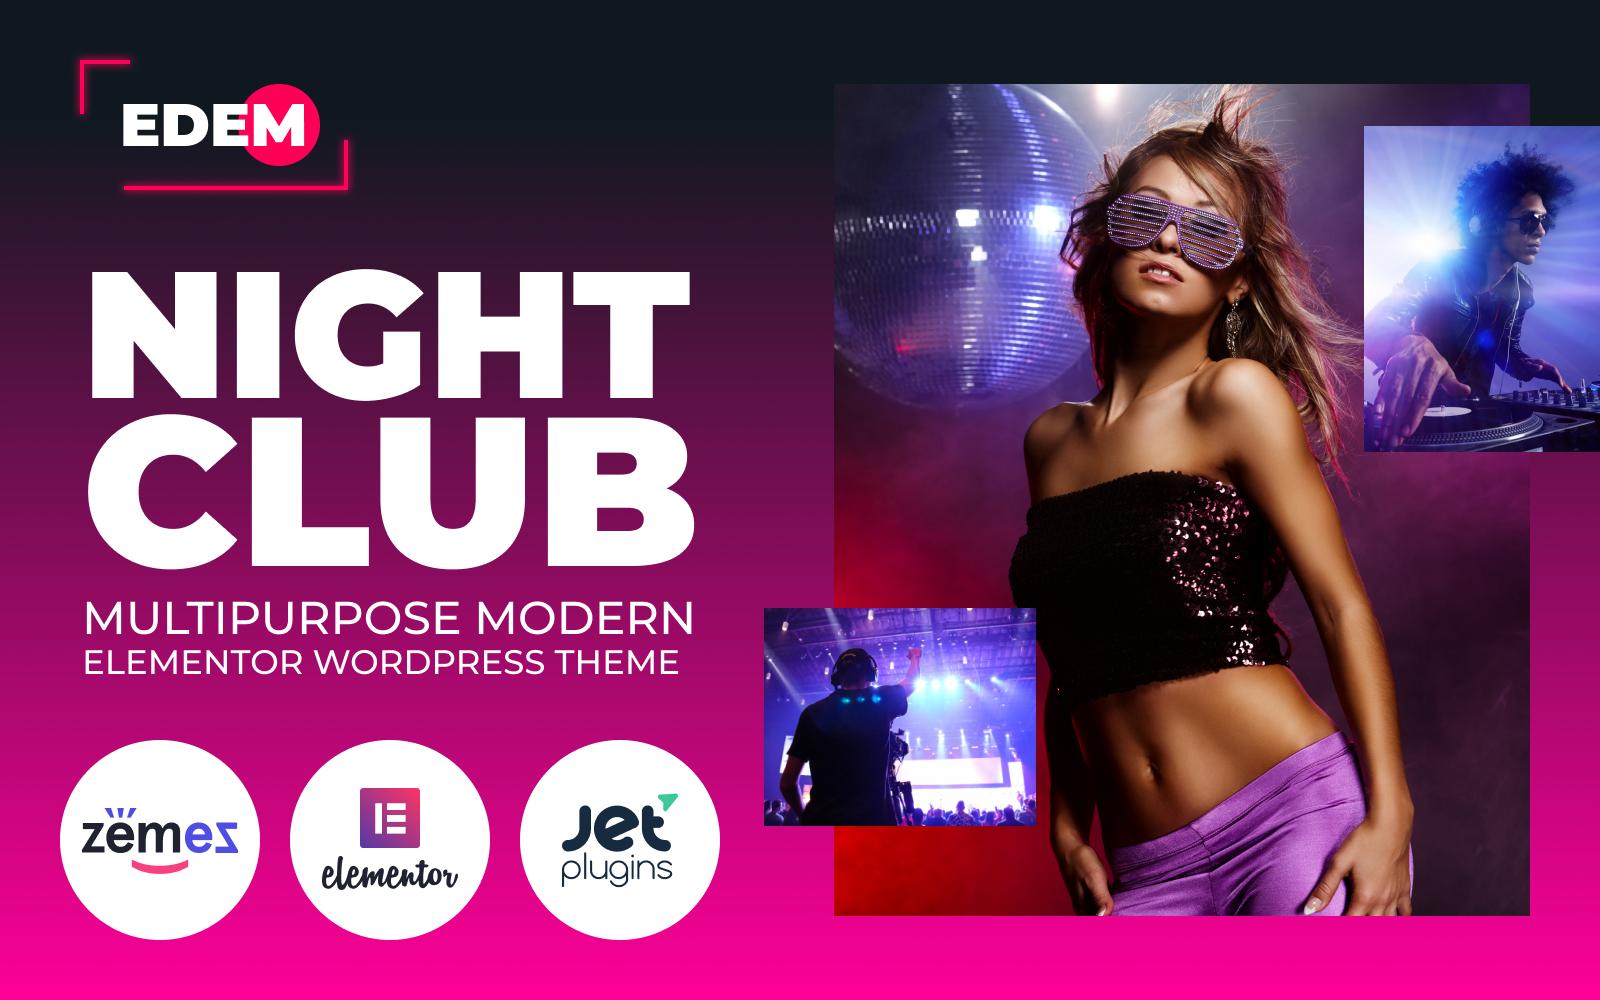 Responsywny motyw WordPress Edem - Night Club Multipurpose Modern Elementor #84736